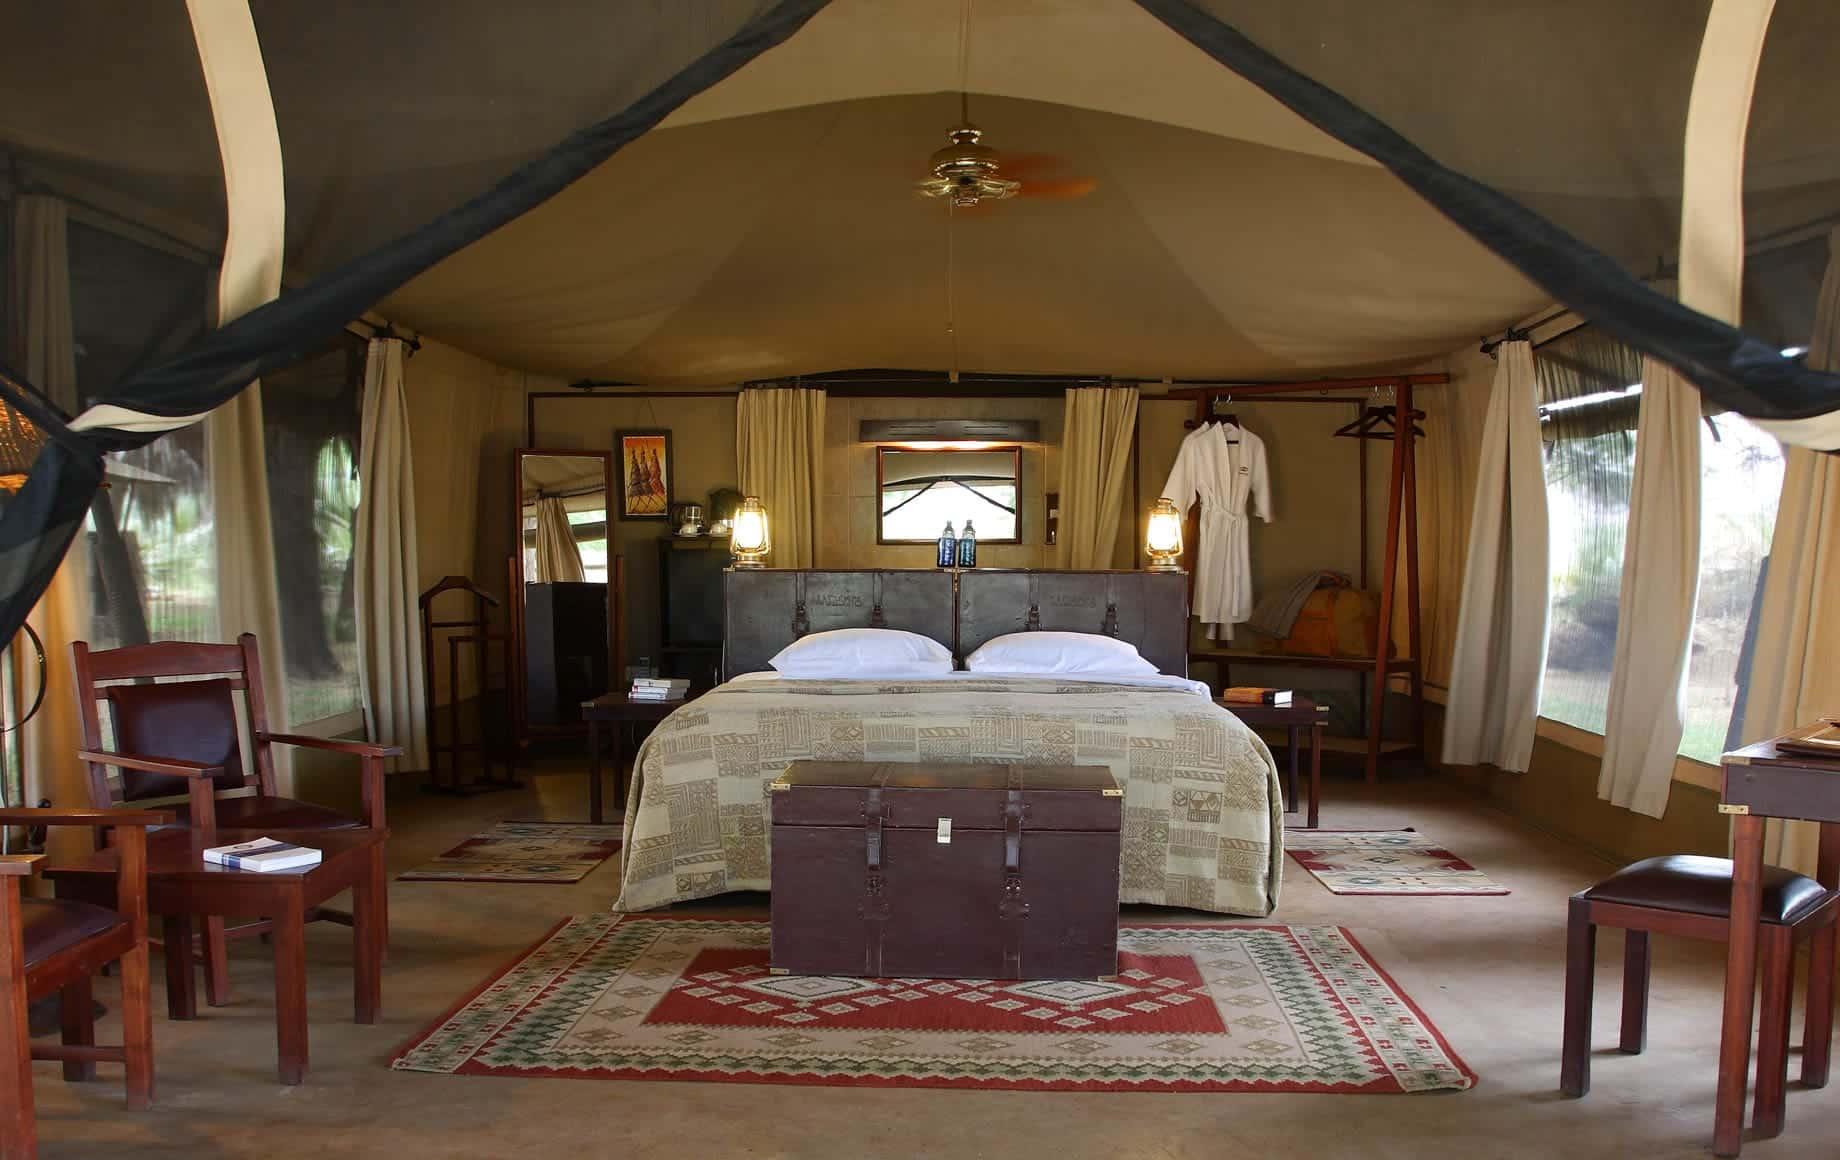 Larsens Camp